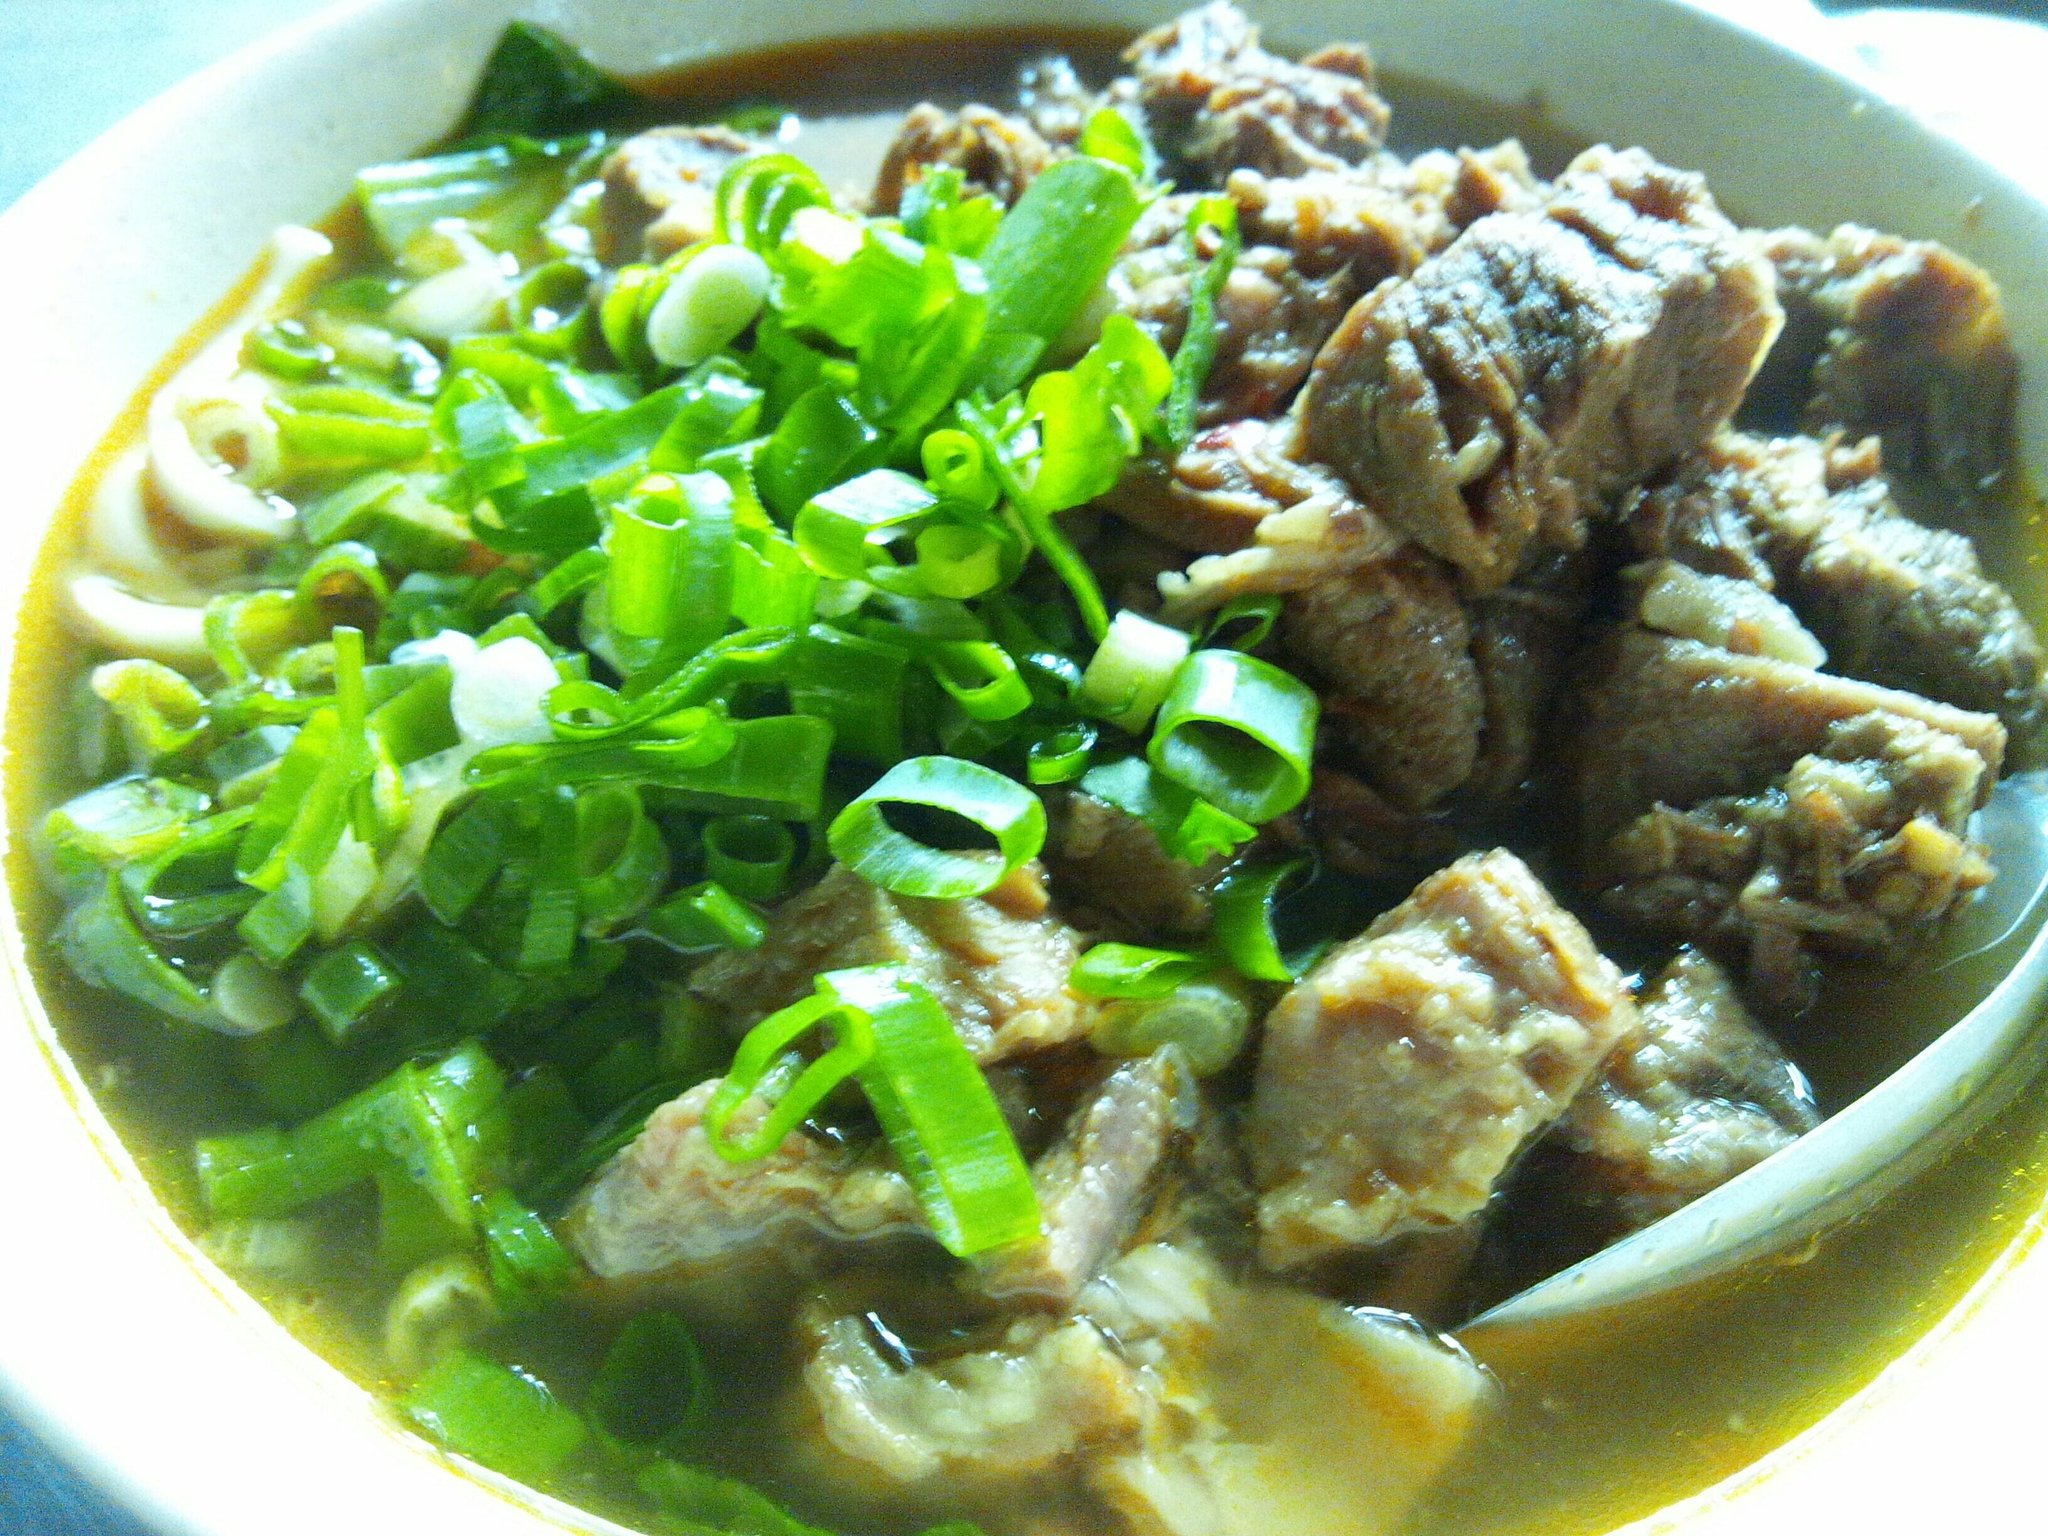 RT @taiwan_lover: 阿娥水餃攤(台北市南京東路二段21巷口路セブンイレブン脇)は水餃子が一番人気だが、二番目が原汁牛肉麺NT$90で凄い人だかり@@。少しだけ辛いが美味しい♪ #台湾旅行 http://t.co/X4j1dX1l7p